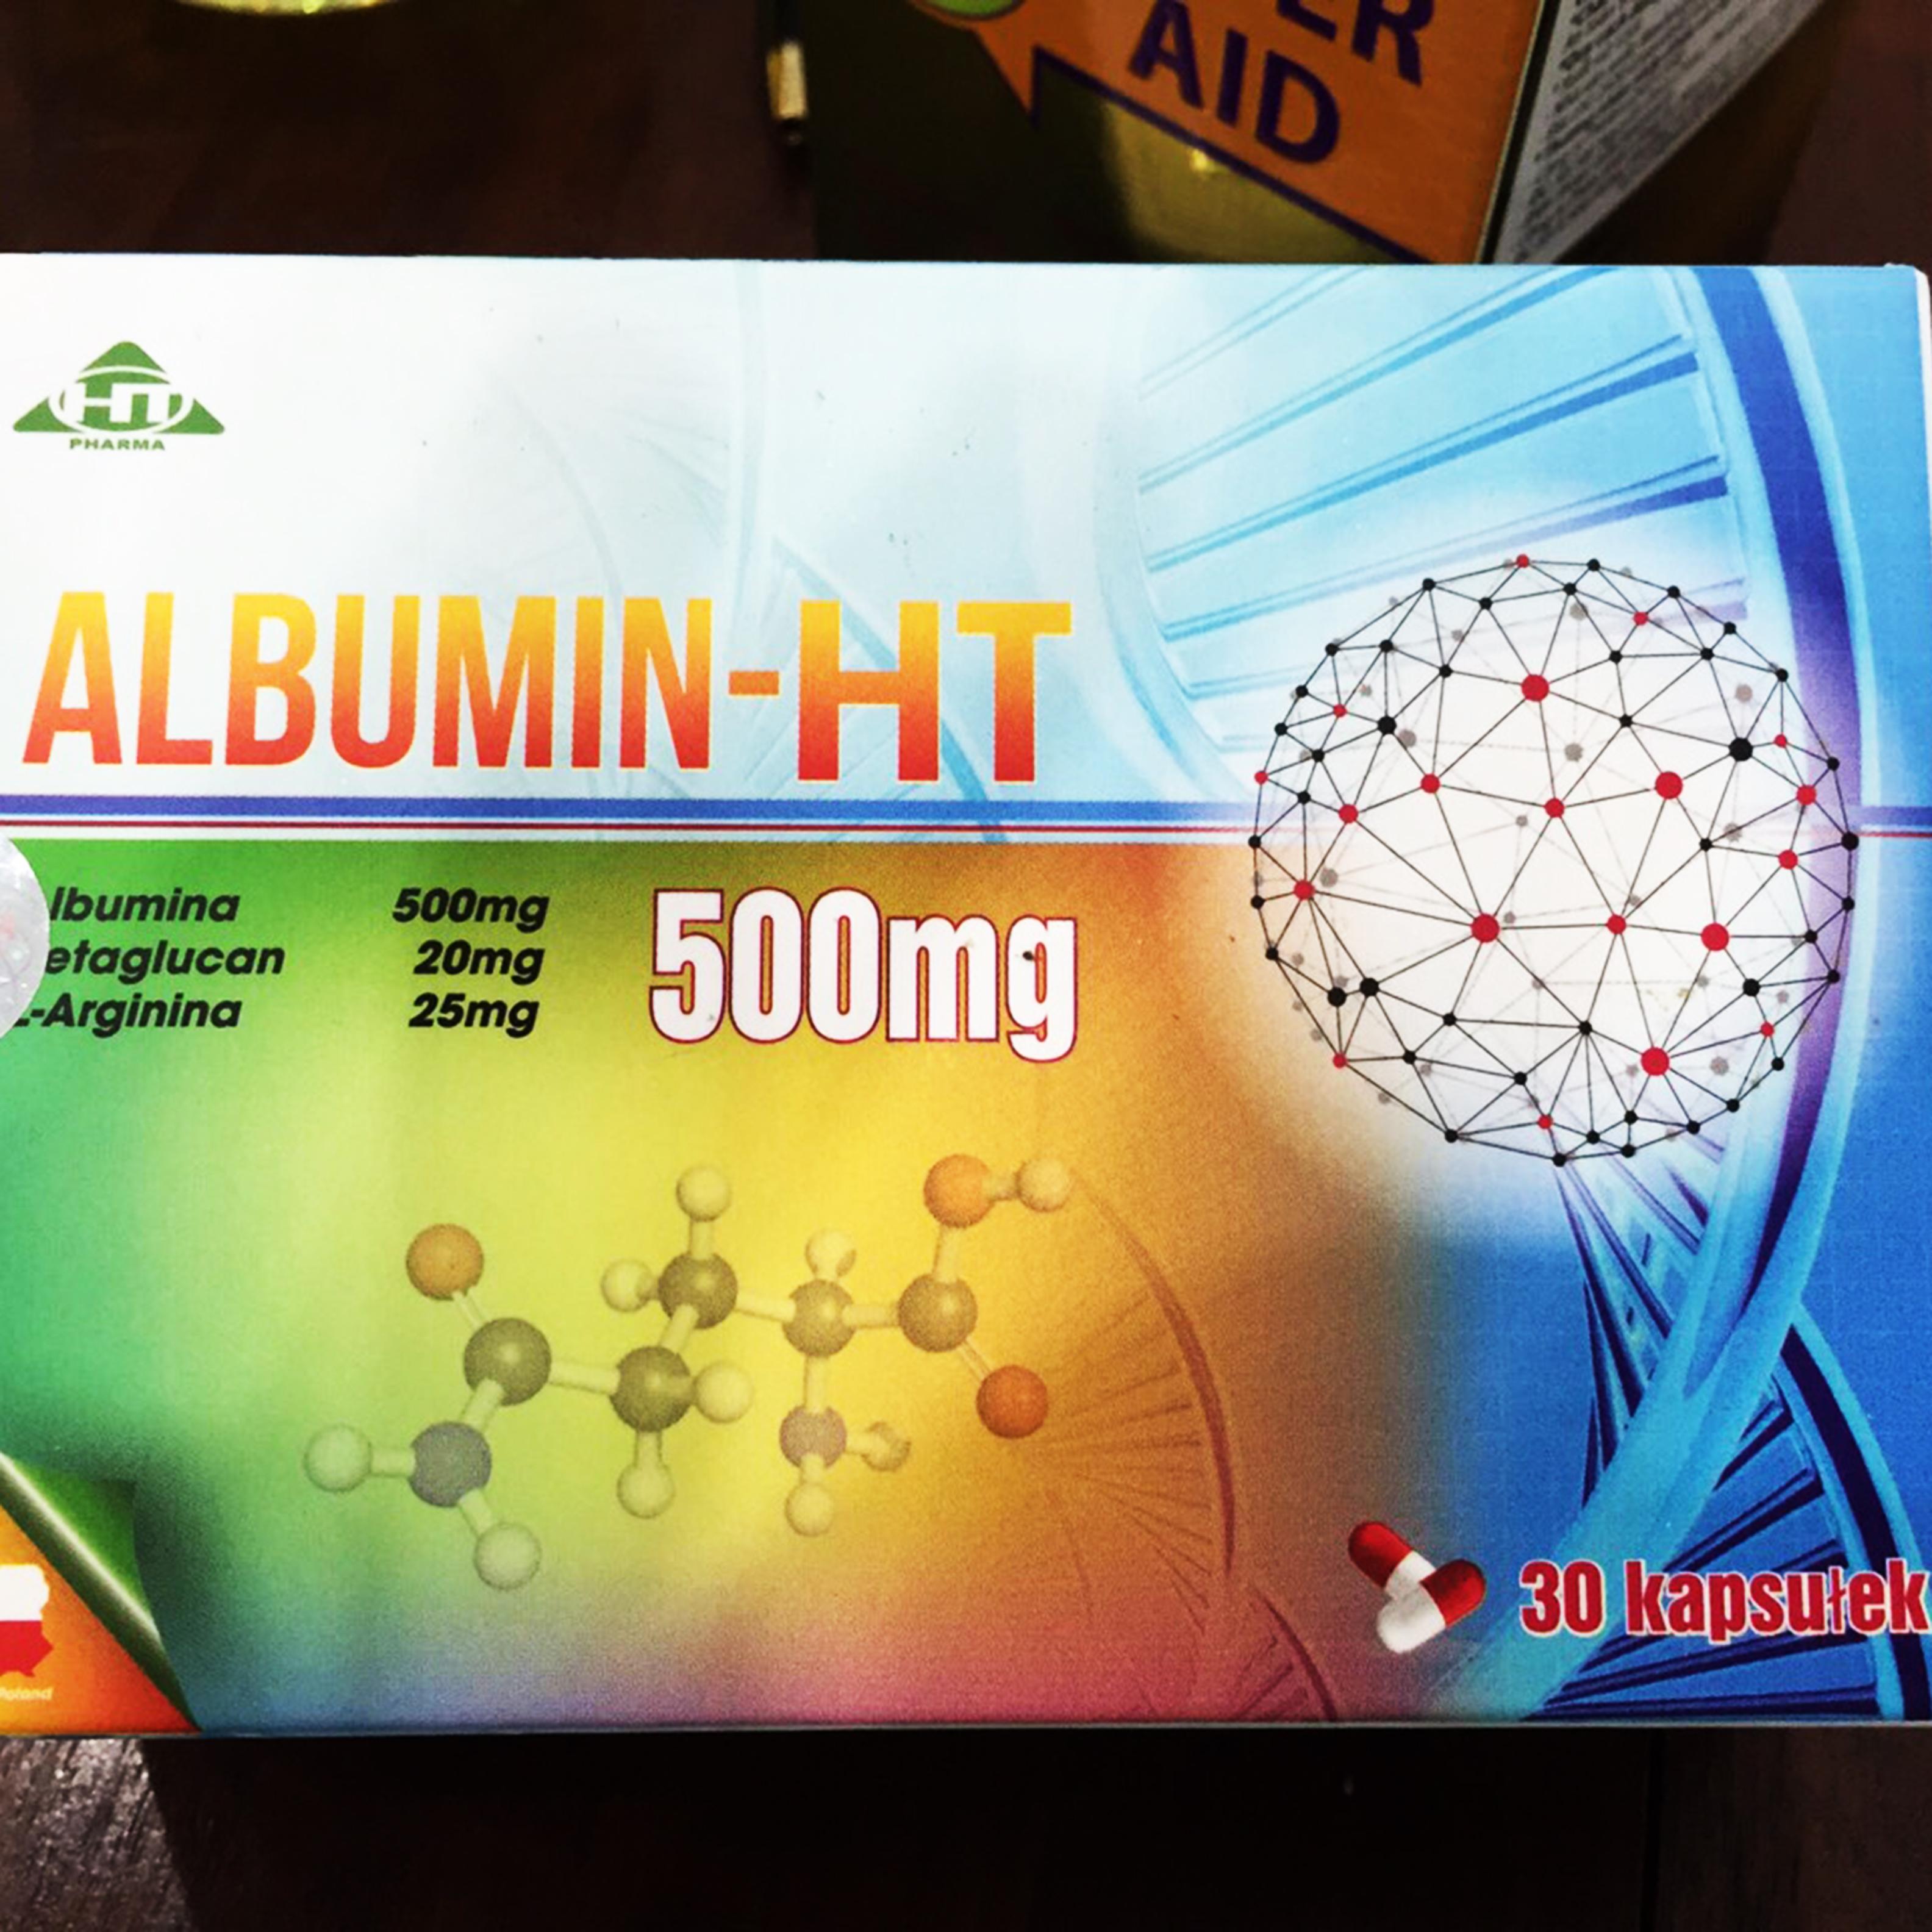 ALBUMIN HT bổ sung albumin protein Acid amin